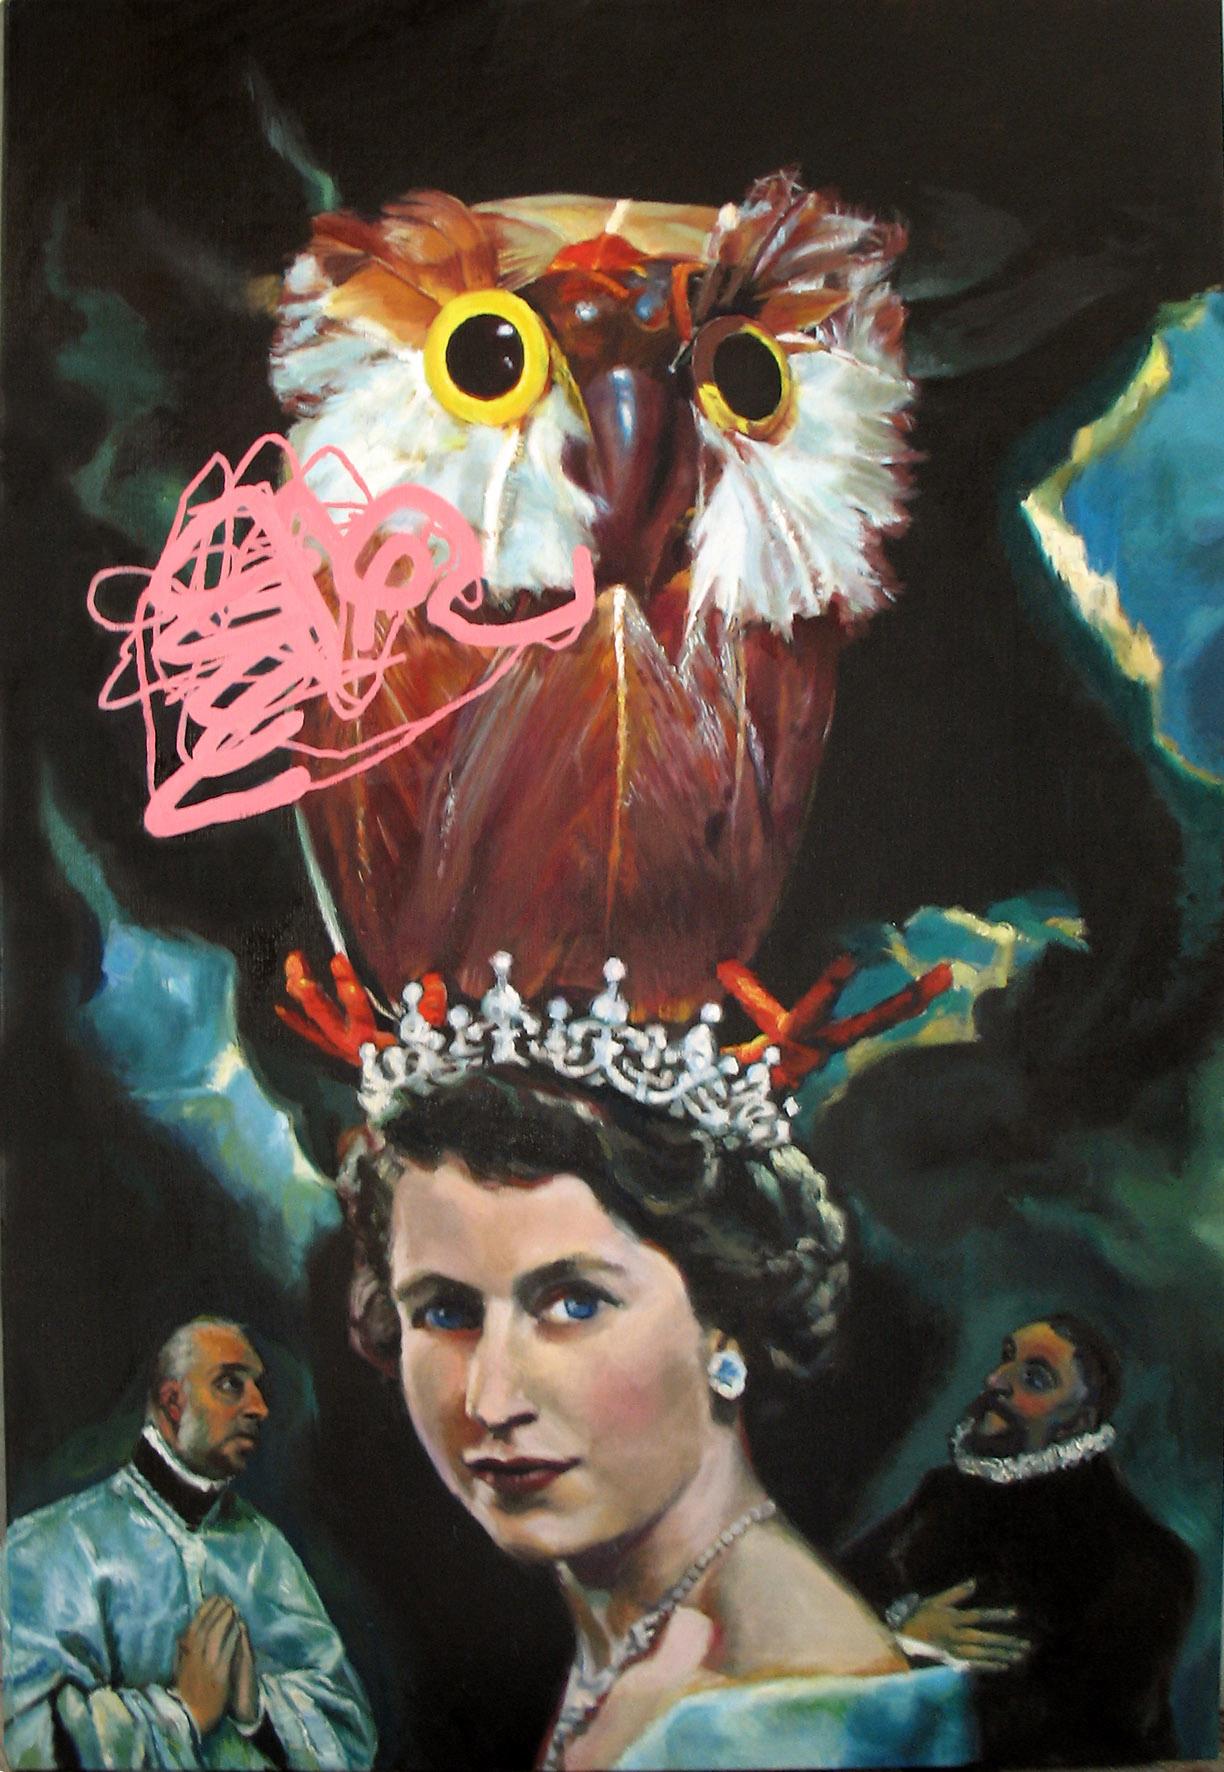 Chris Aerfeldt 'Brave Owl gets his toes stuck in Lizzie's crown' 165 x 114 cm